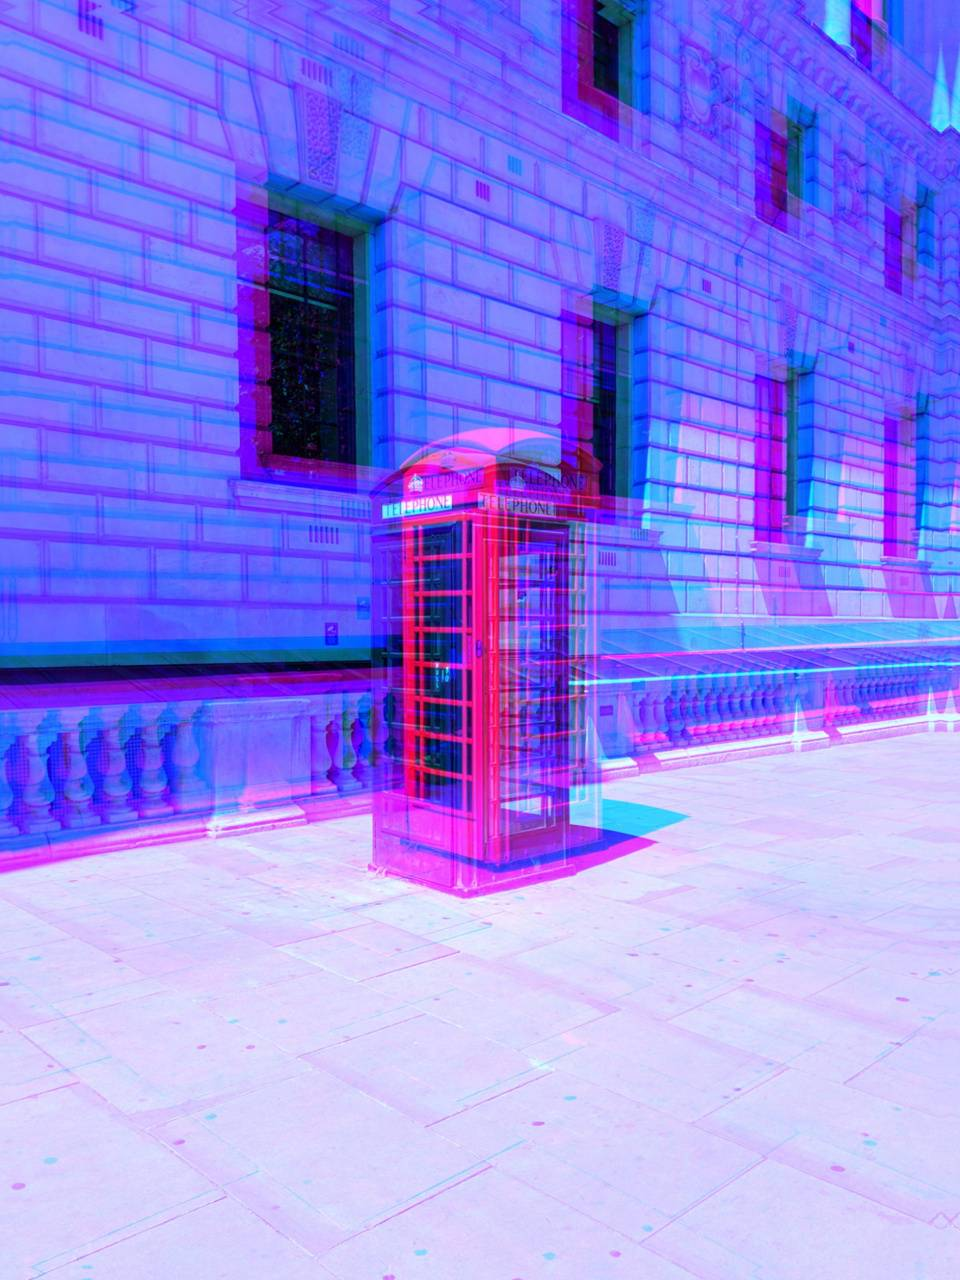 Colored London